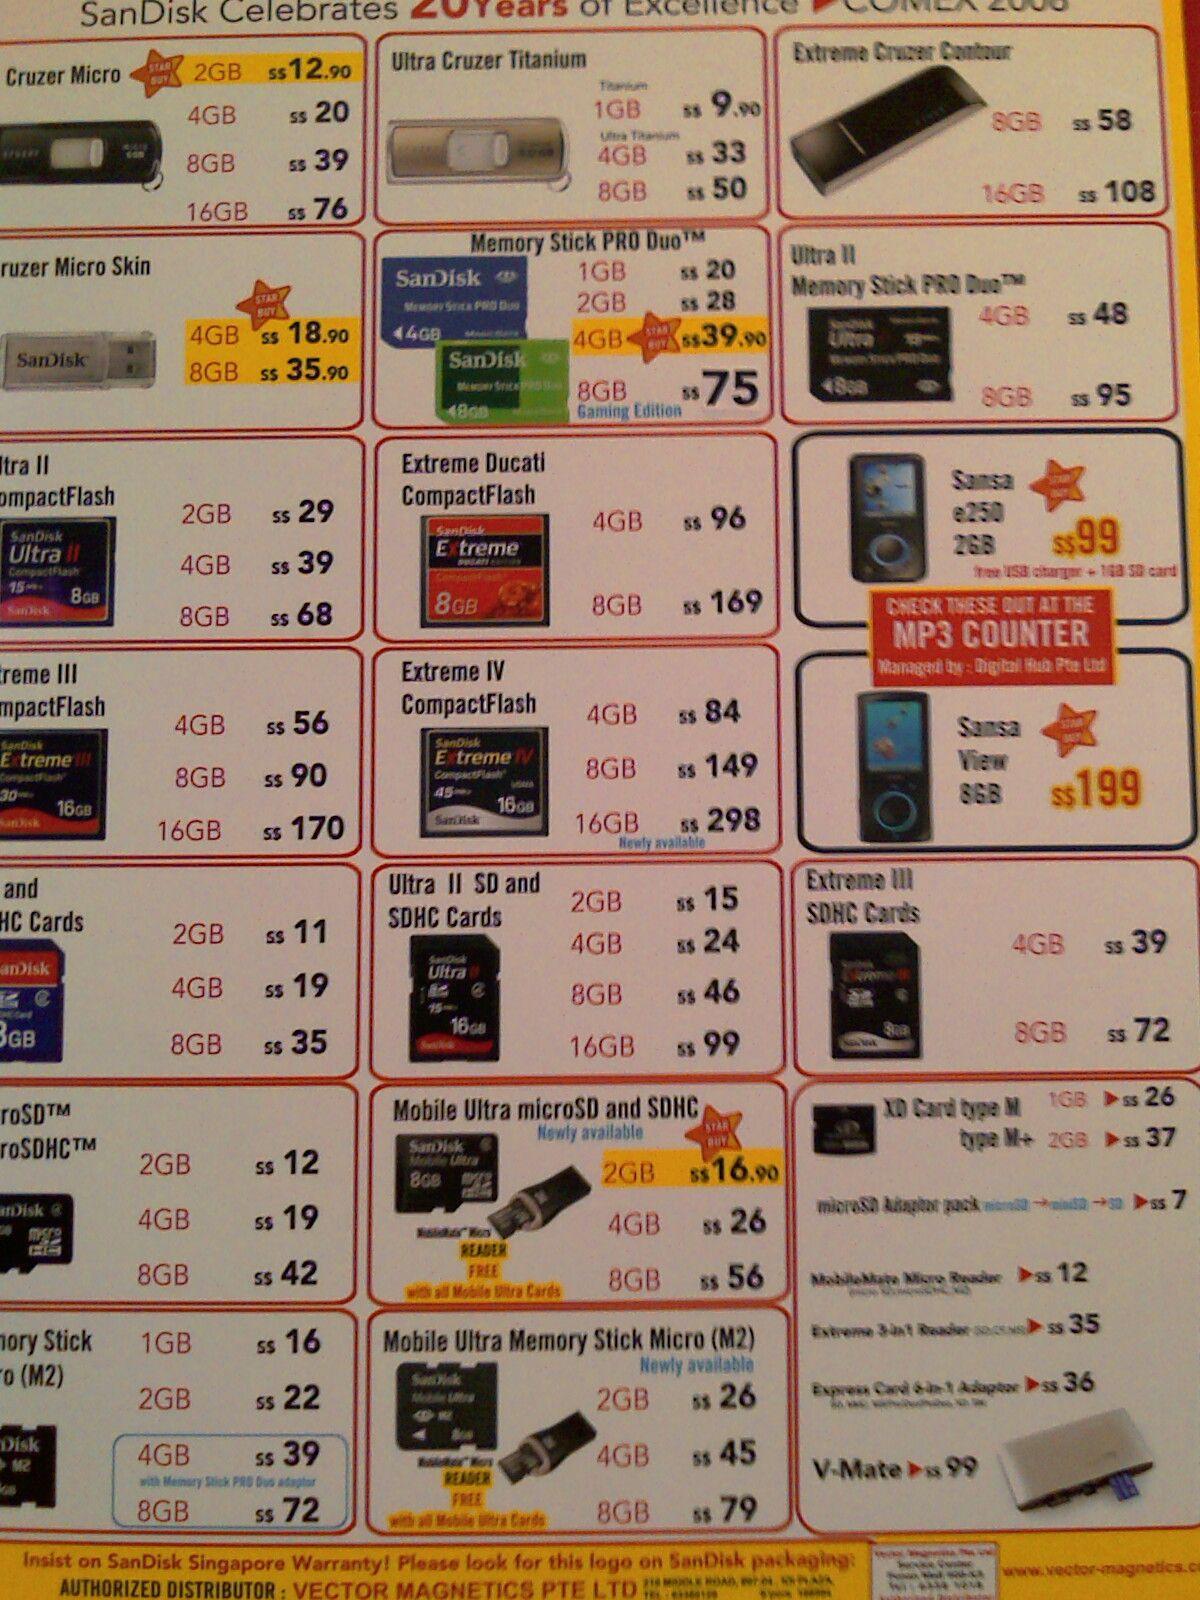 Comex 2008 price list image brochure of Sandisk As1